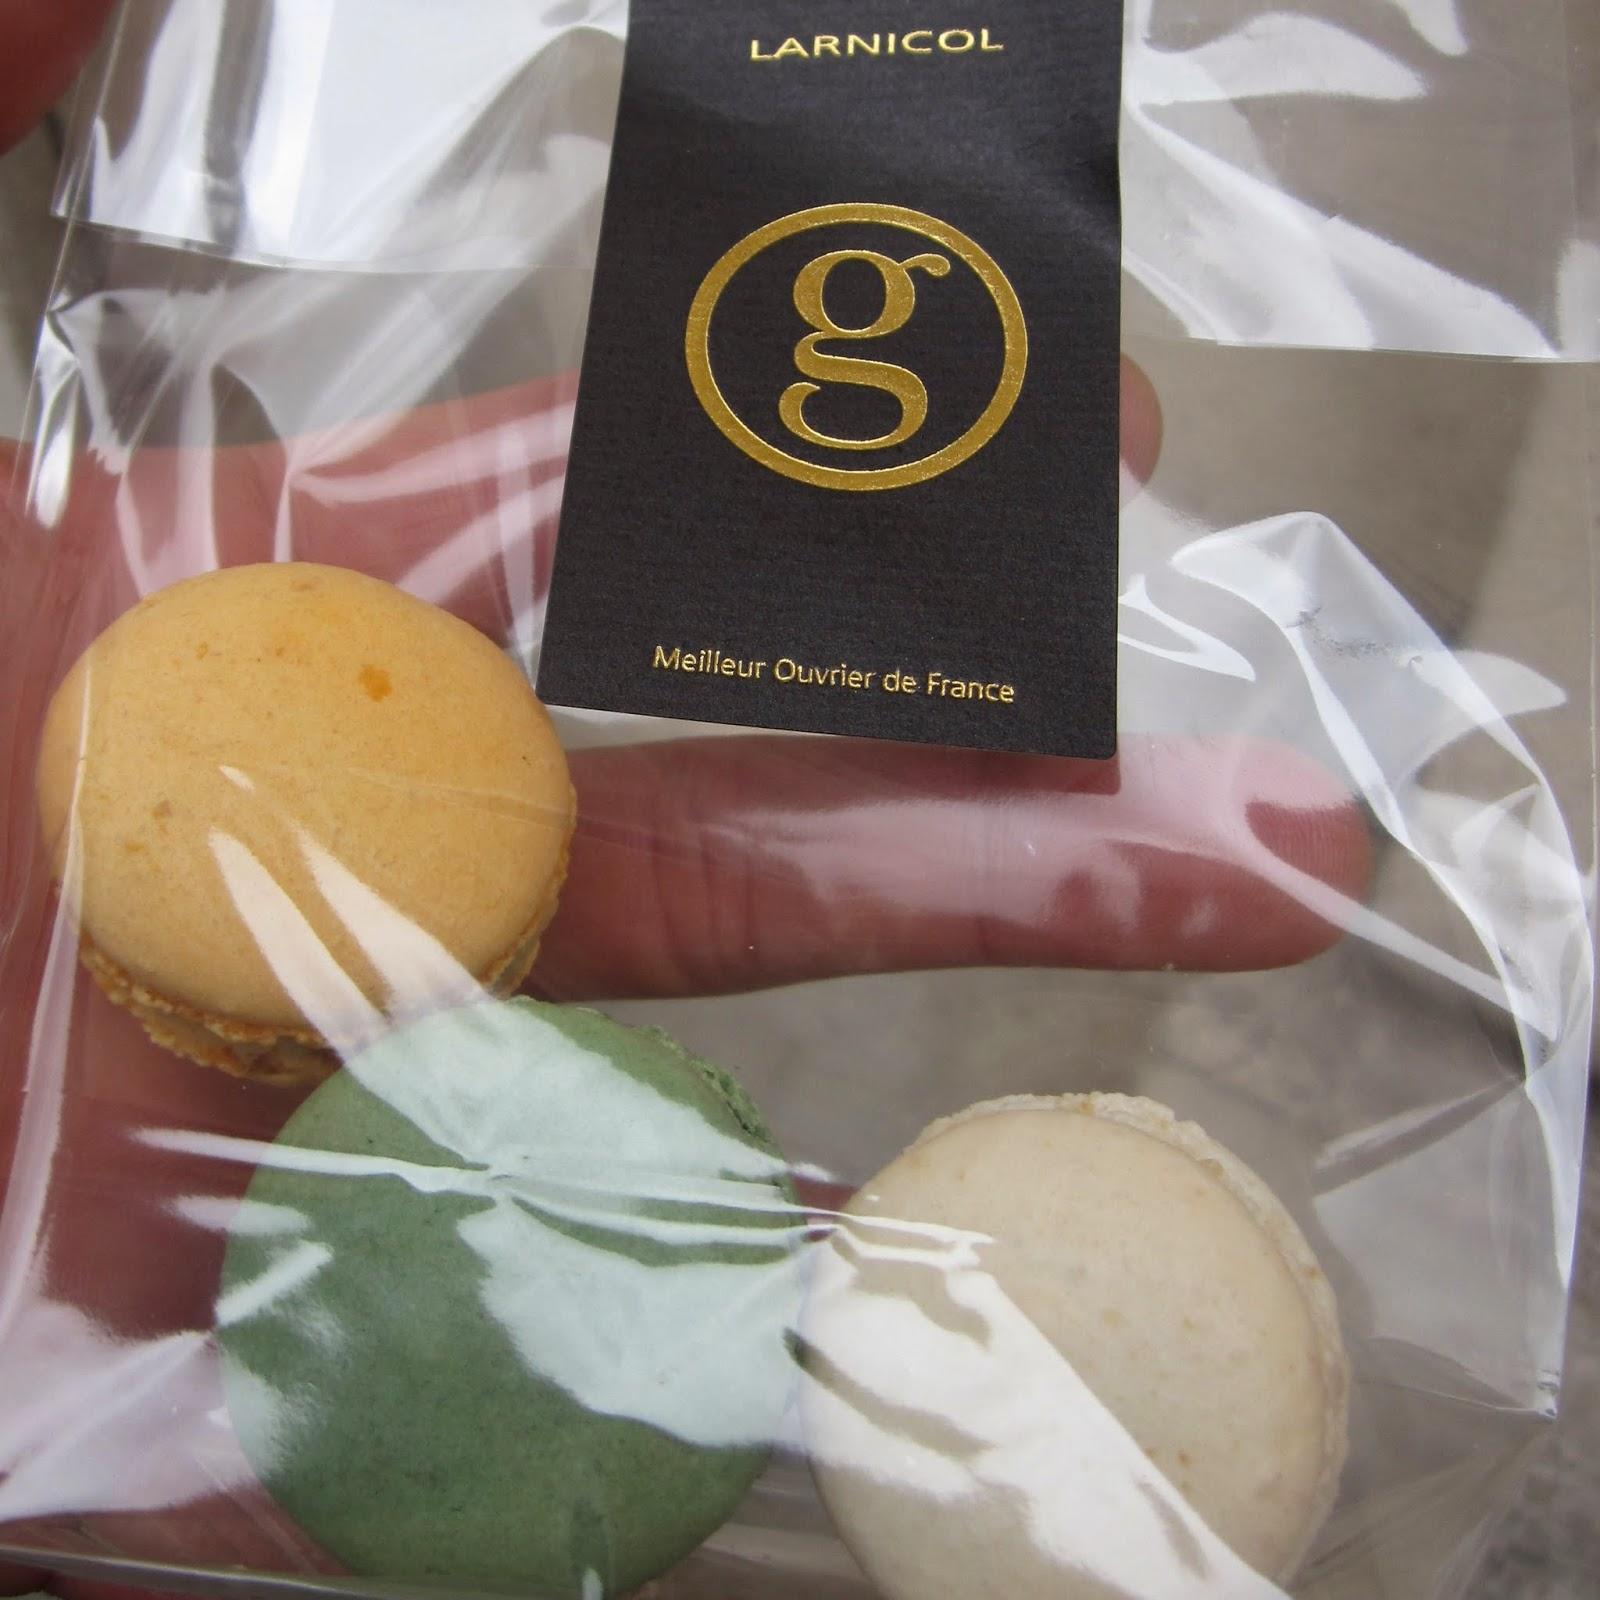 Georges Larnicol macarons Paris France